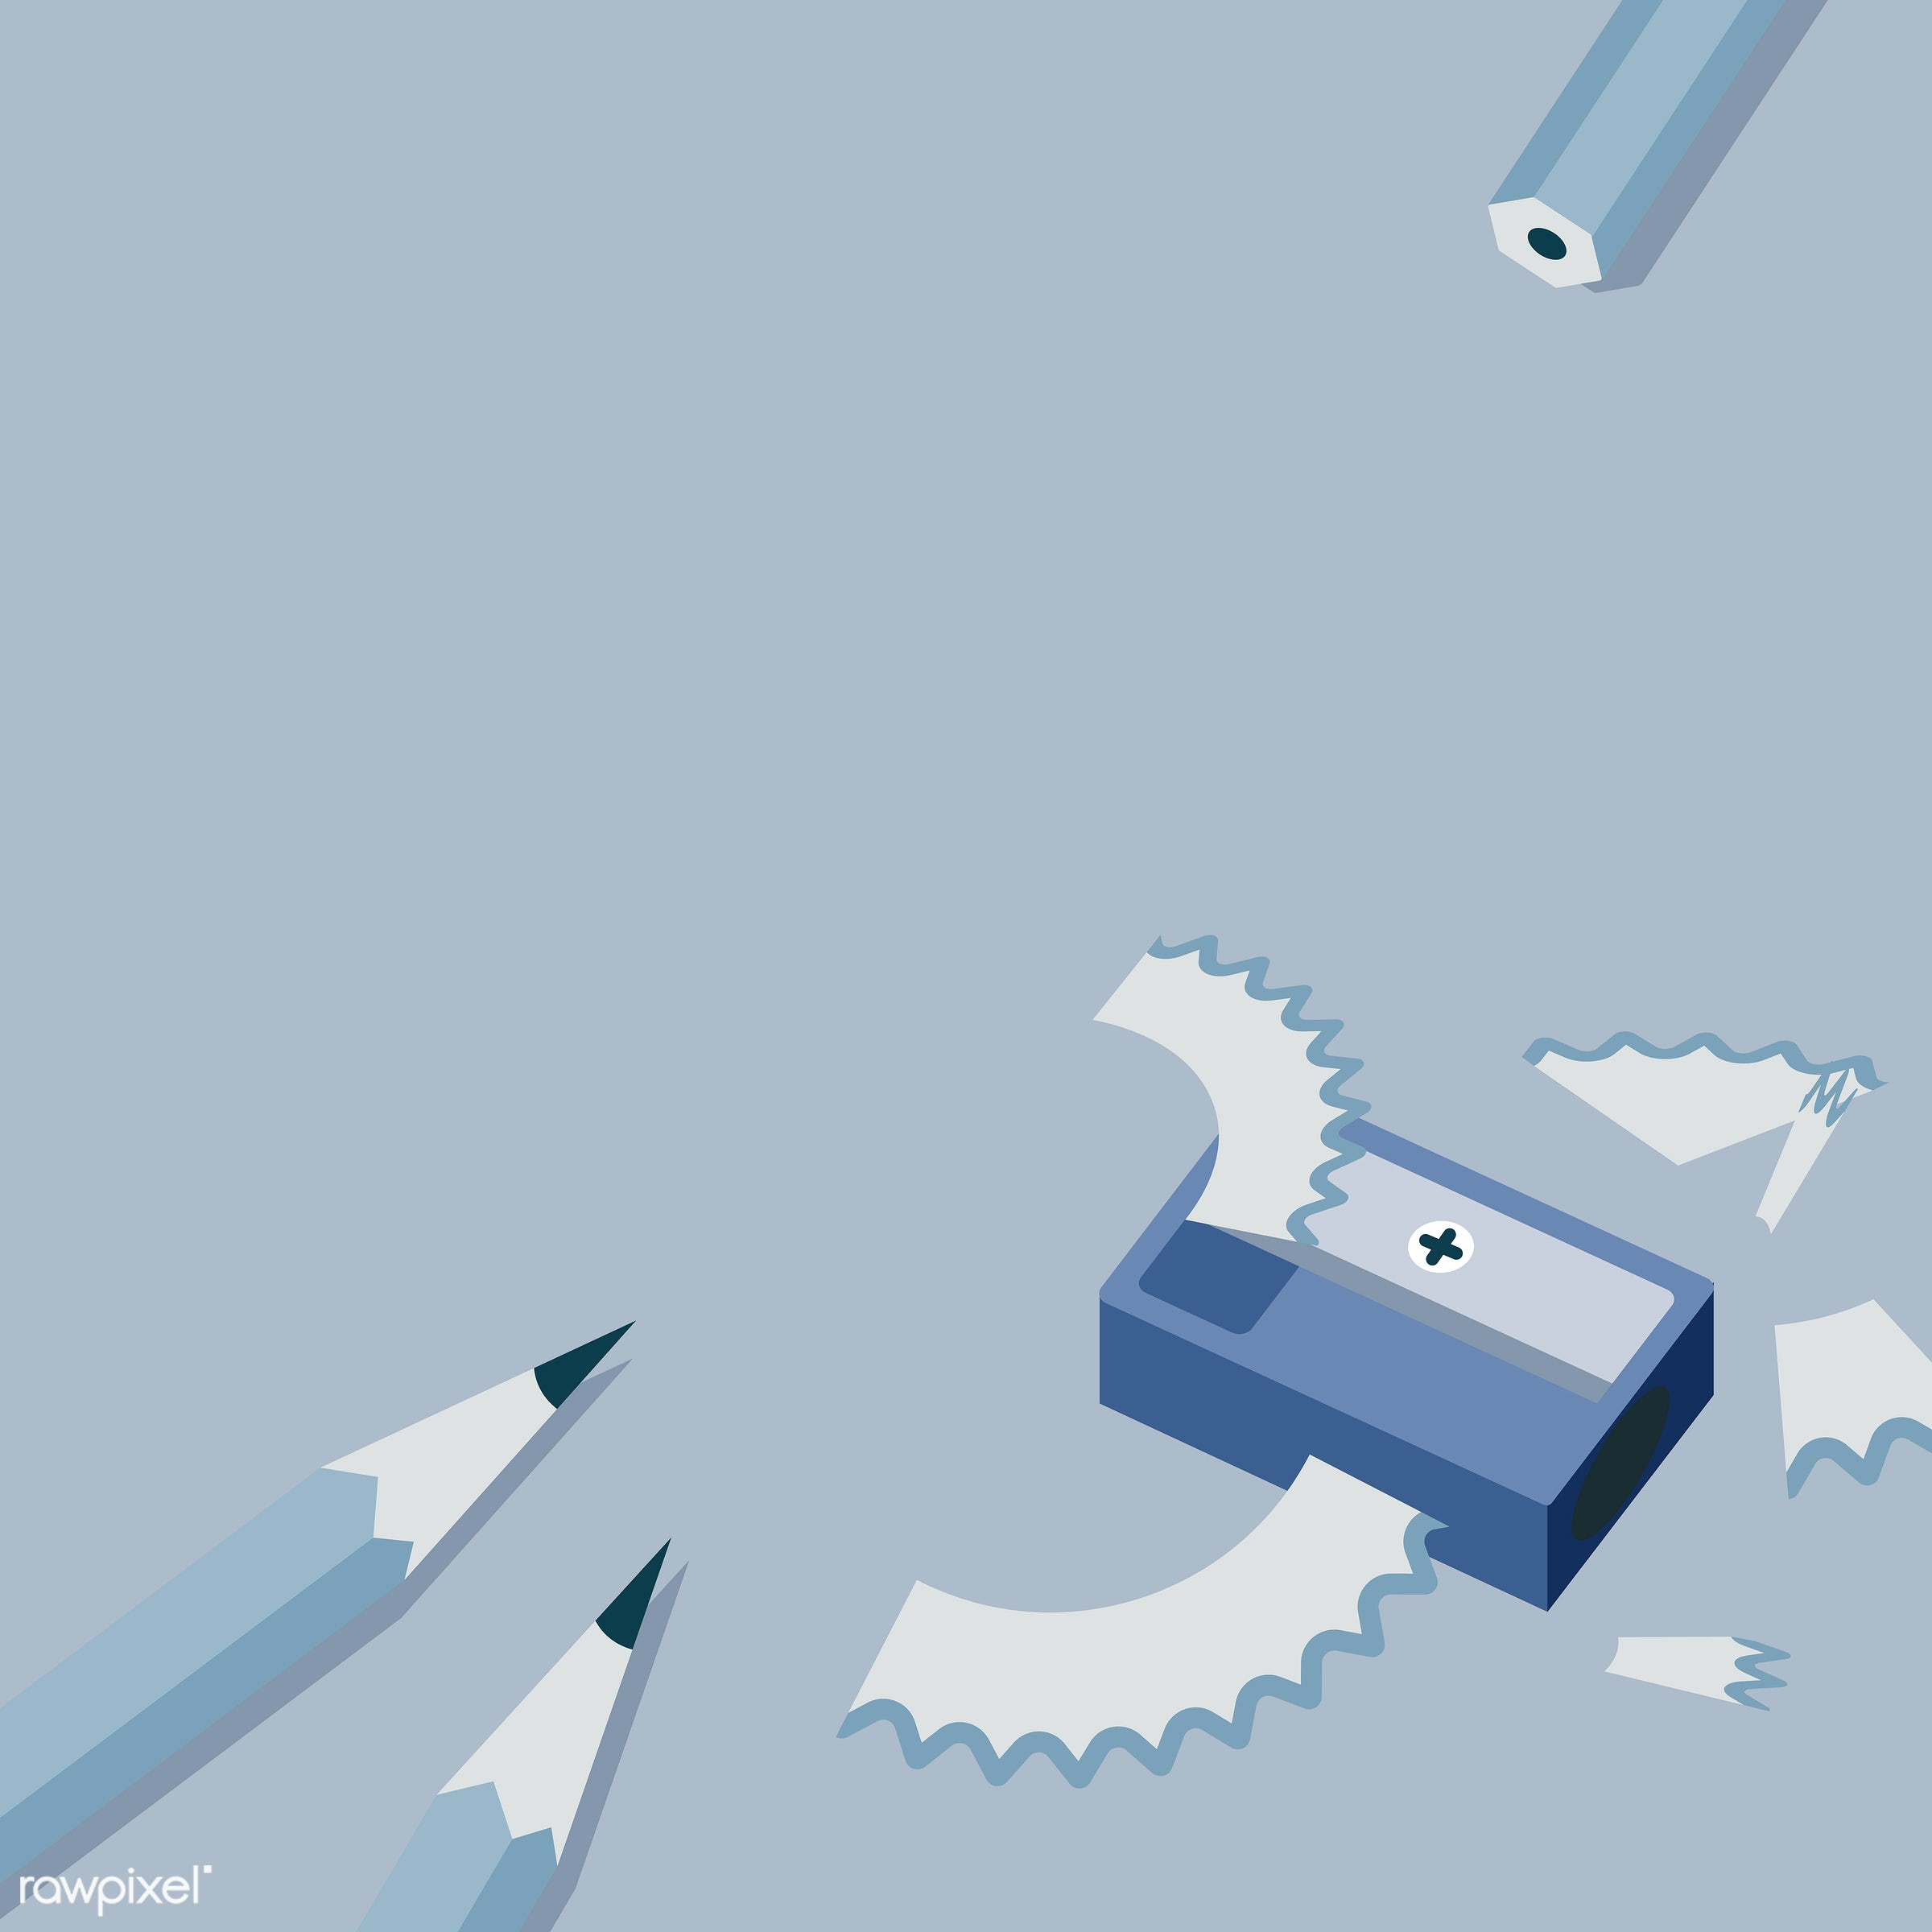 Pencil sharpener  - blue, brain, concept, conceptual, illustration, manual, mind, pencil, pencil sharpener, sharp, sharpen,...